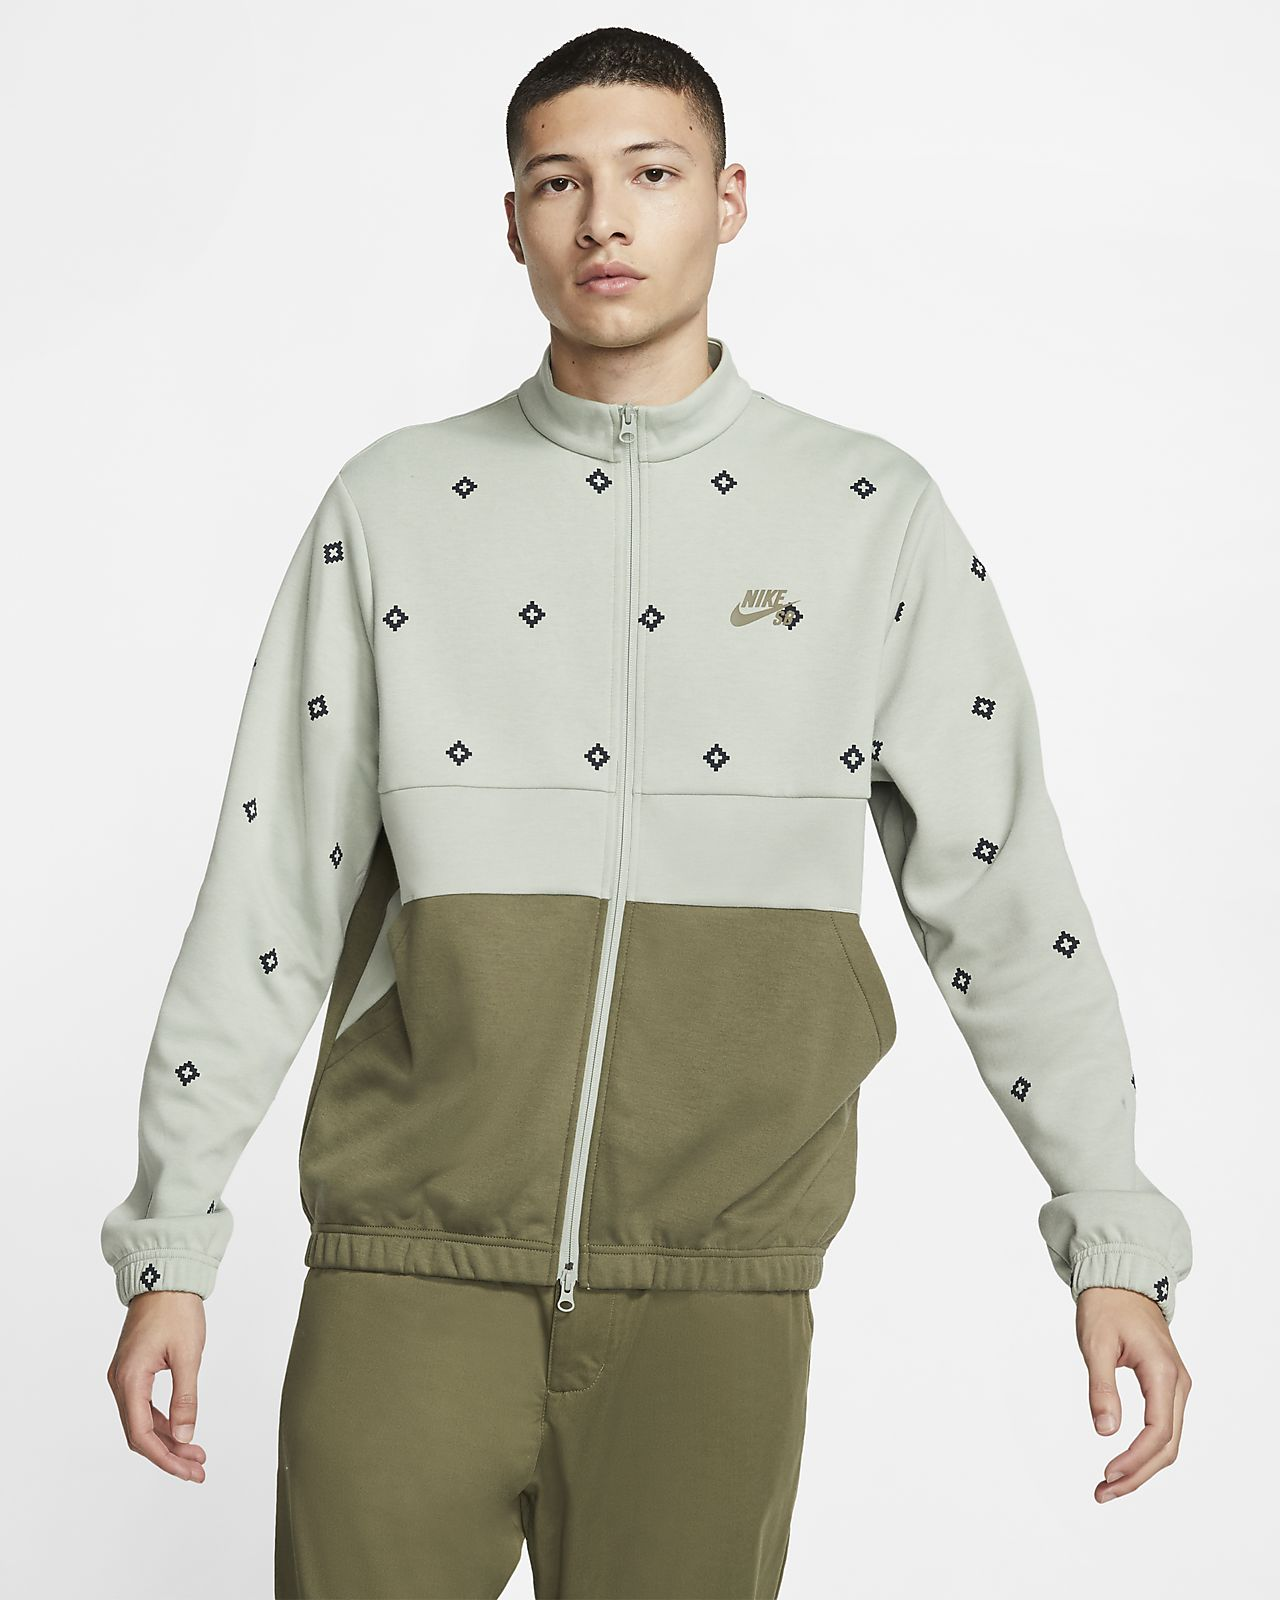 Nike SB Dri-FIT Men's Printed Skate Track Jacket